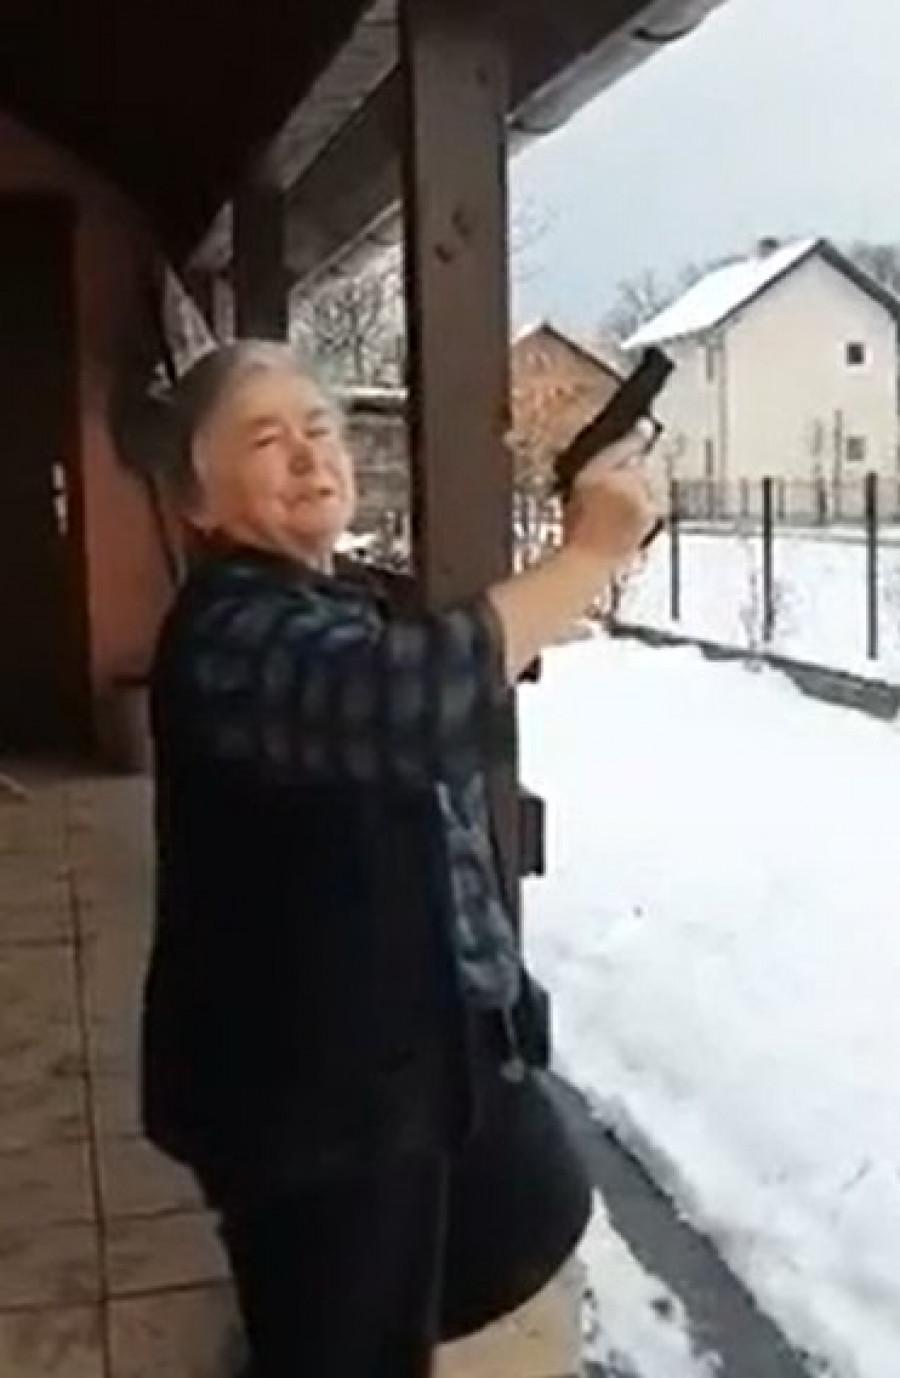 teen uzima prvi veliki kurac